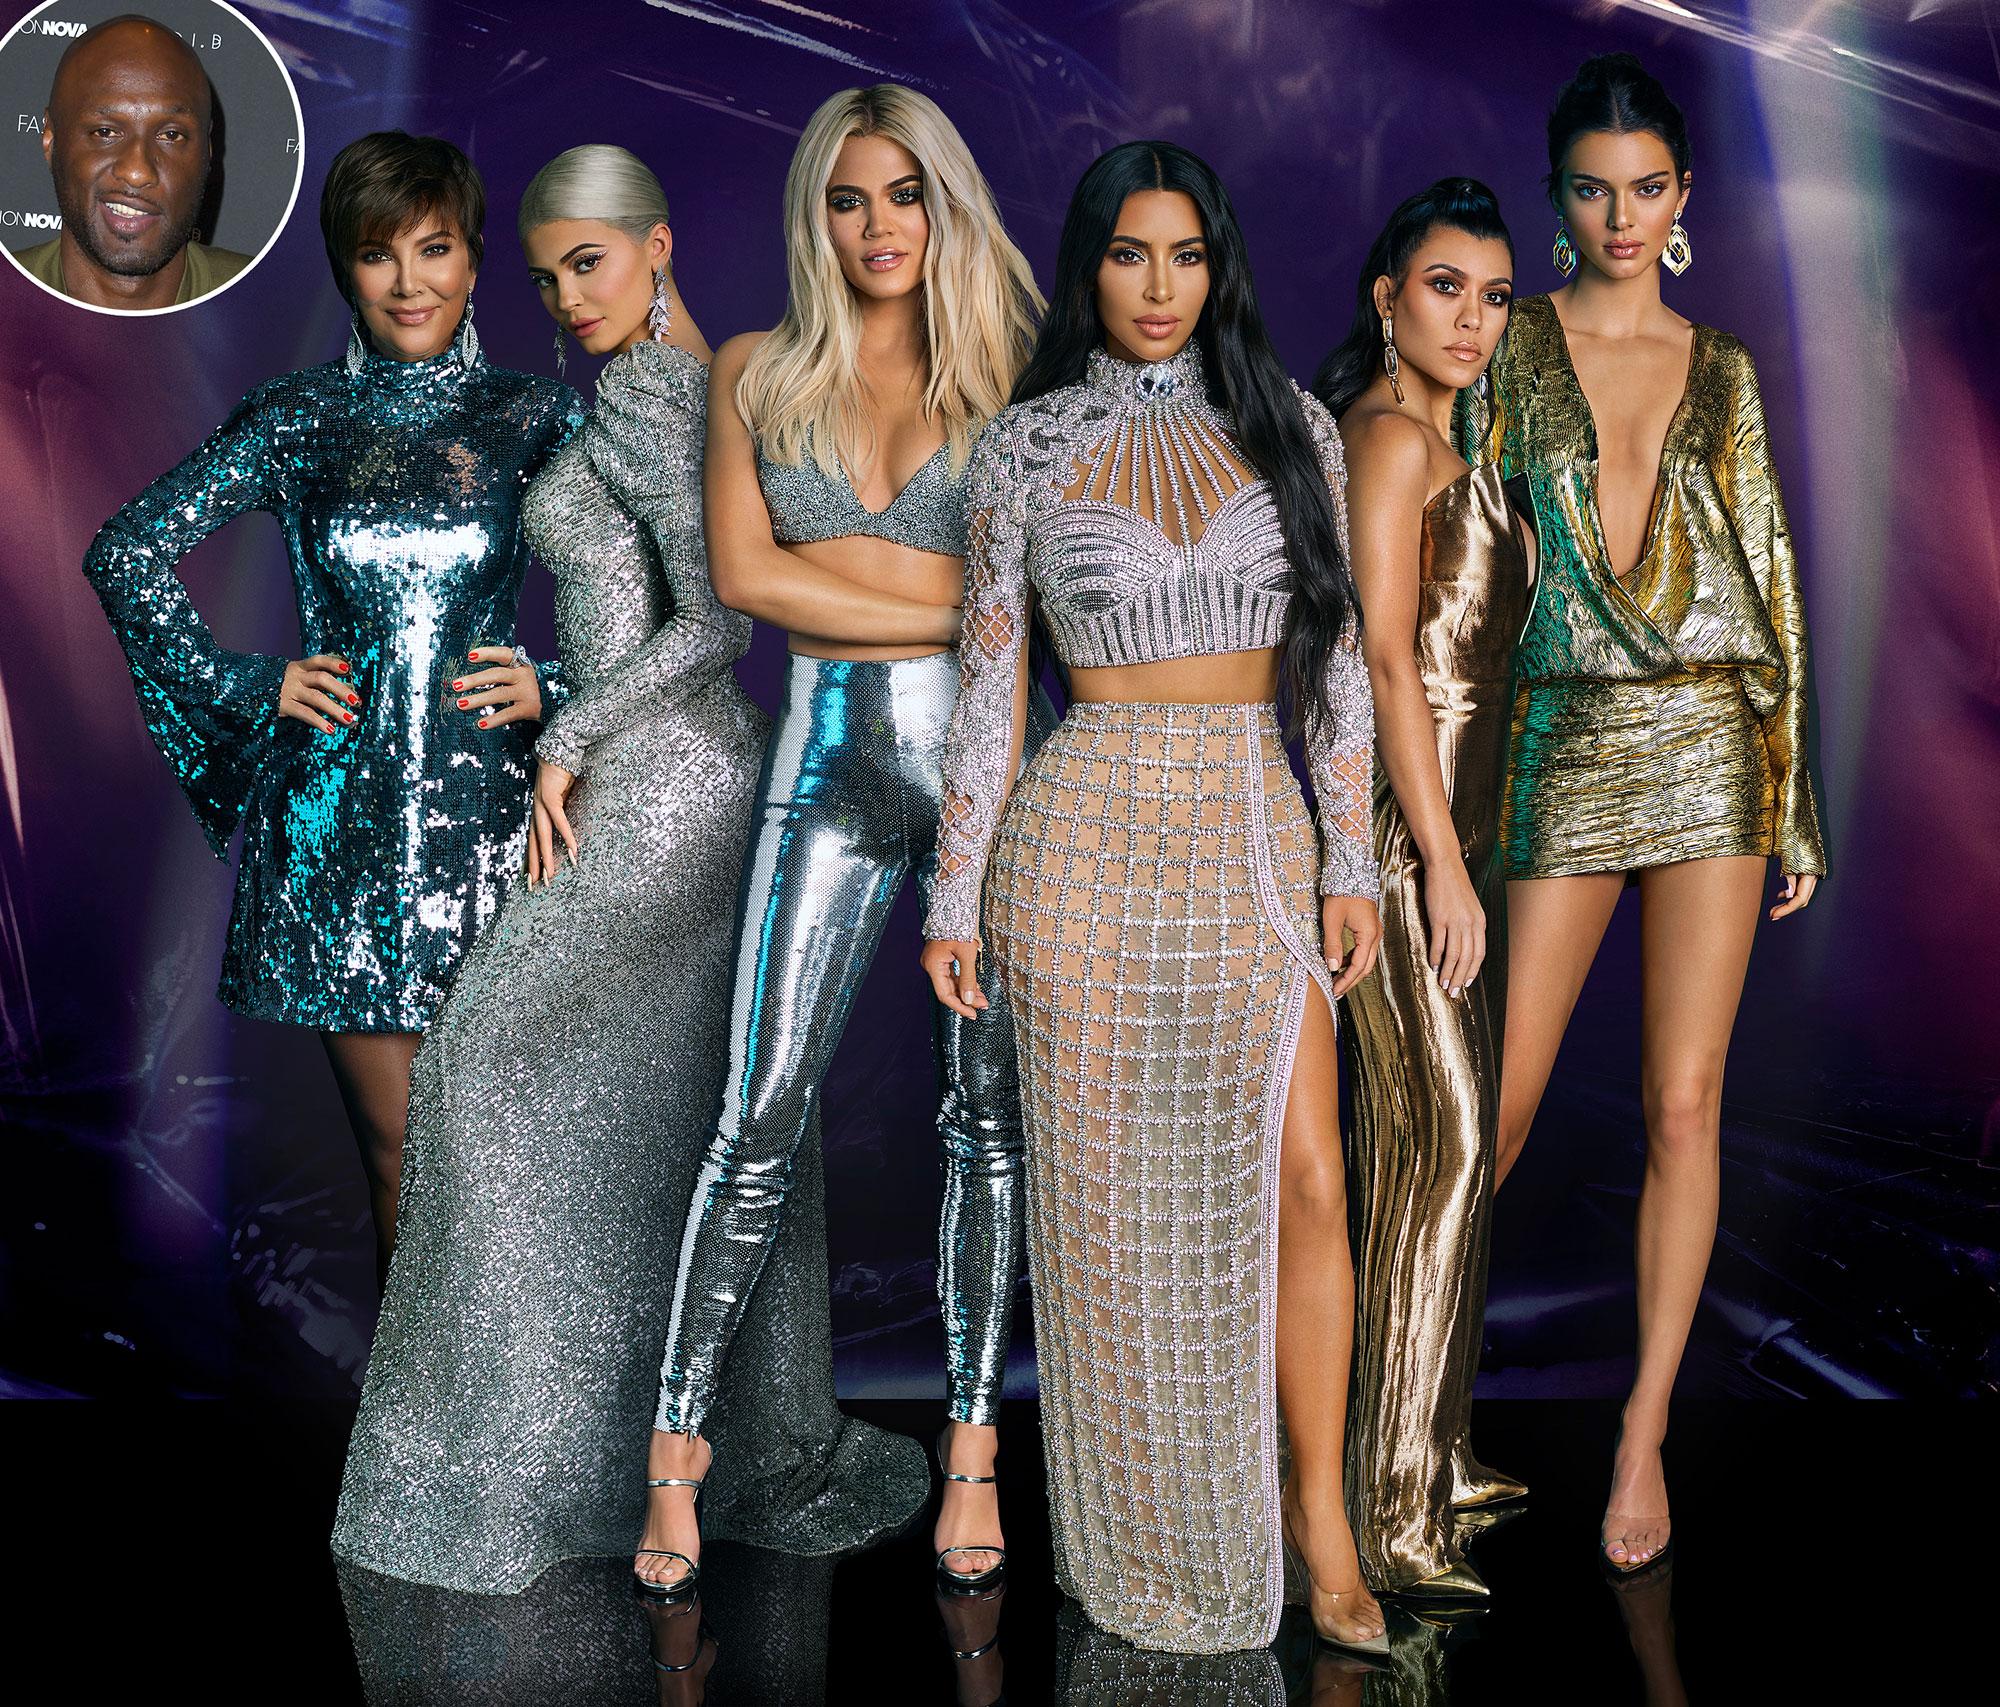 Kardashians Not Worried About Lamar Odom Book - The Kardashians and Lamar Odom